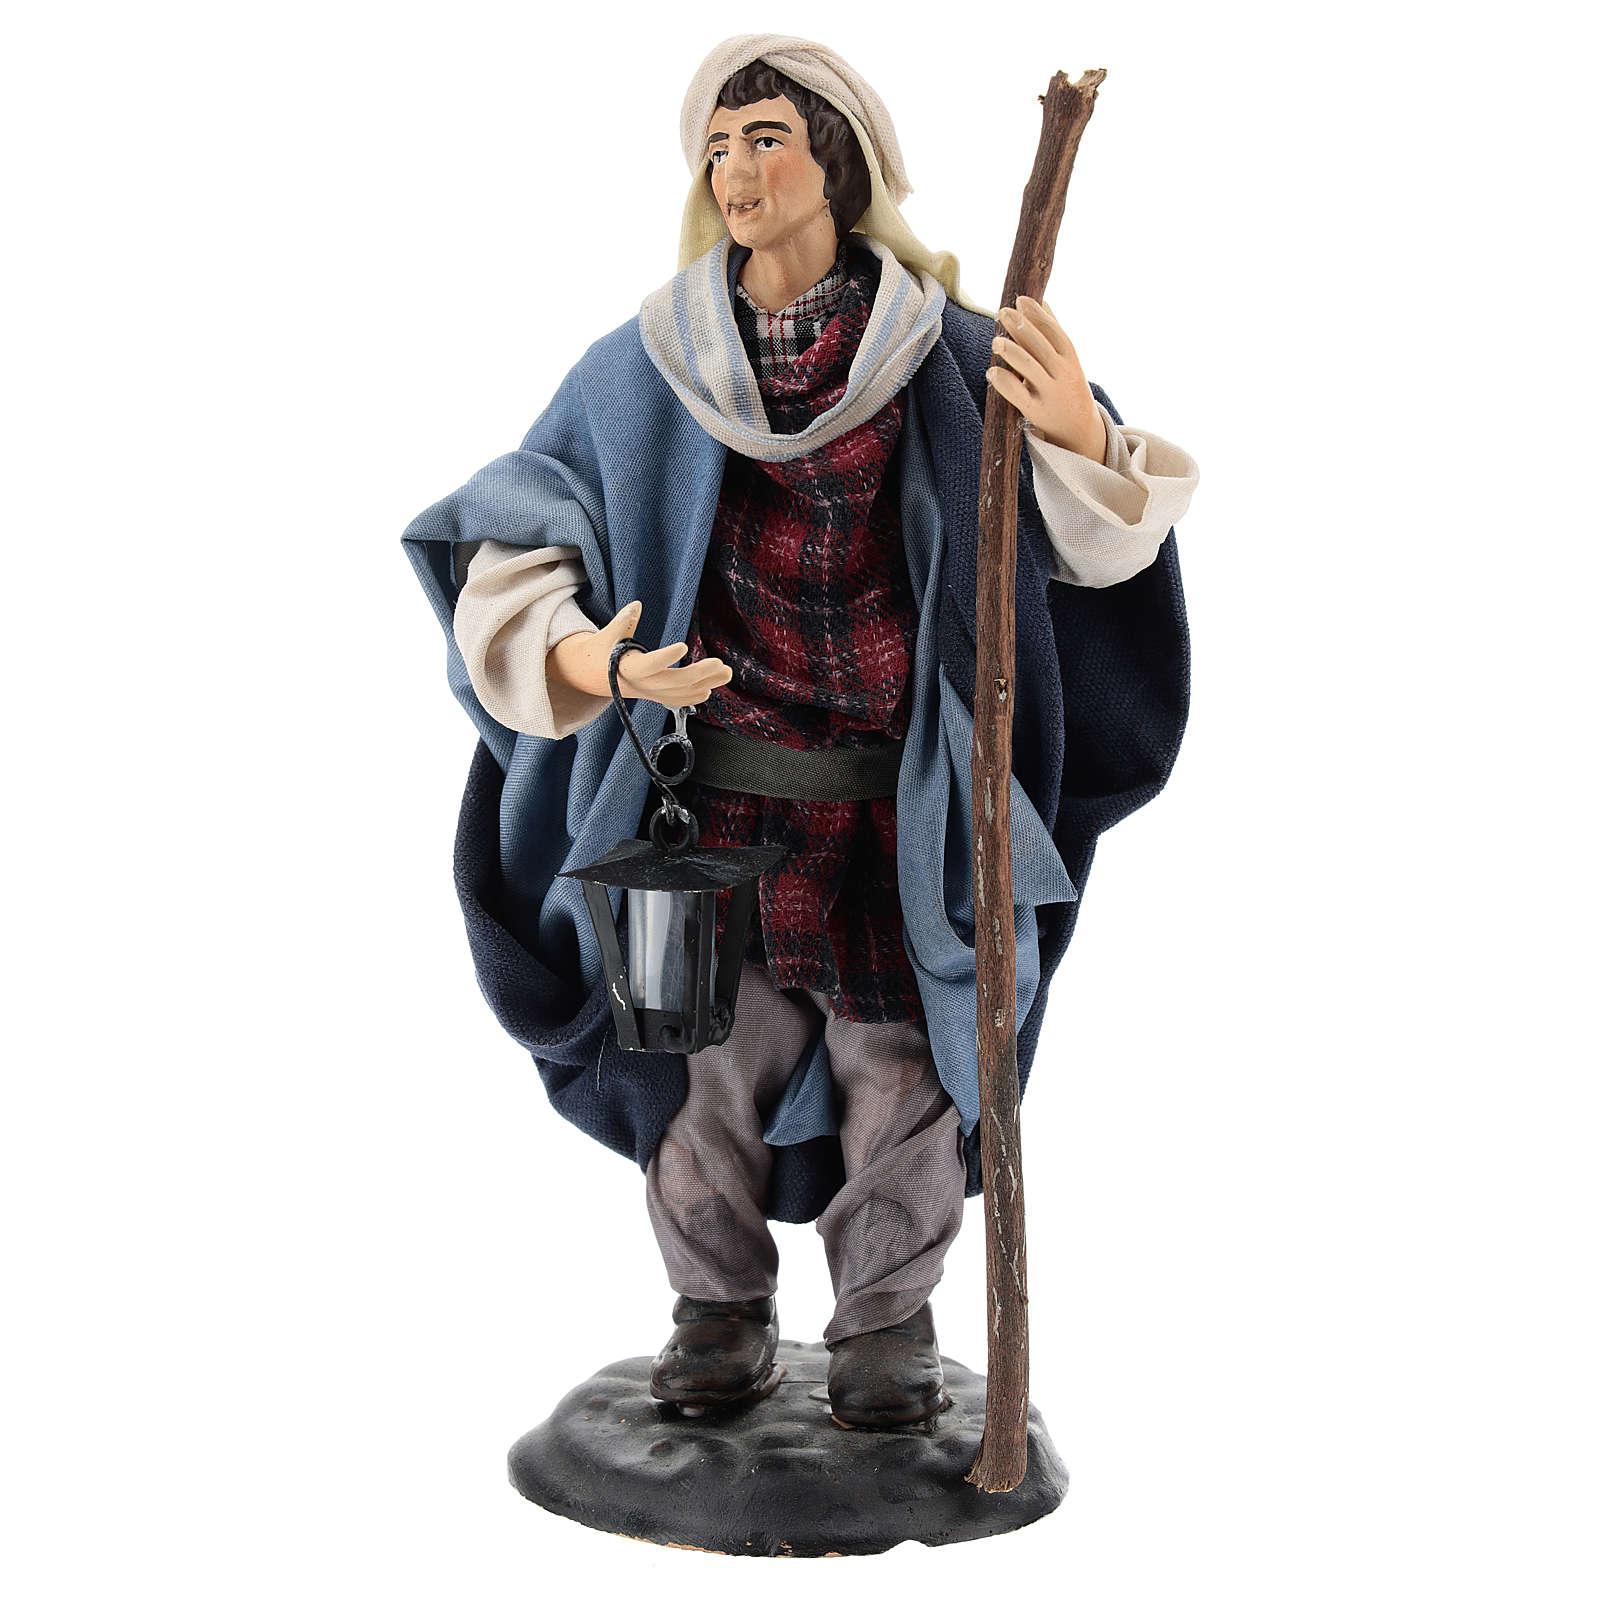 Hombre con farol 18 cm pesebre Napolitano 4